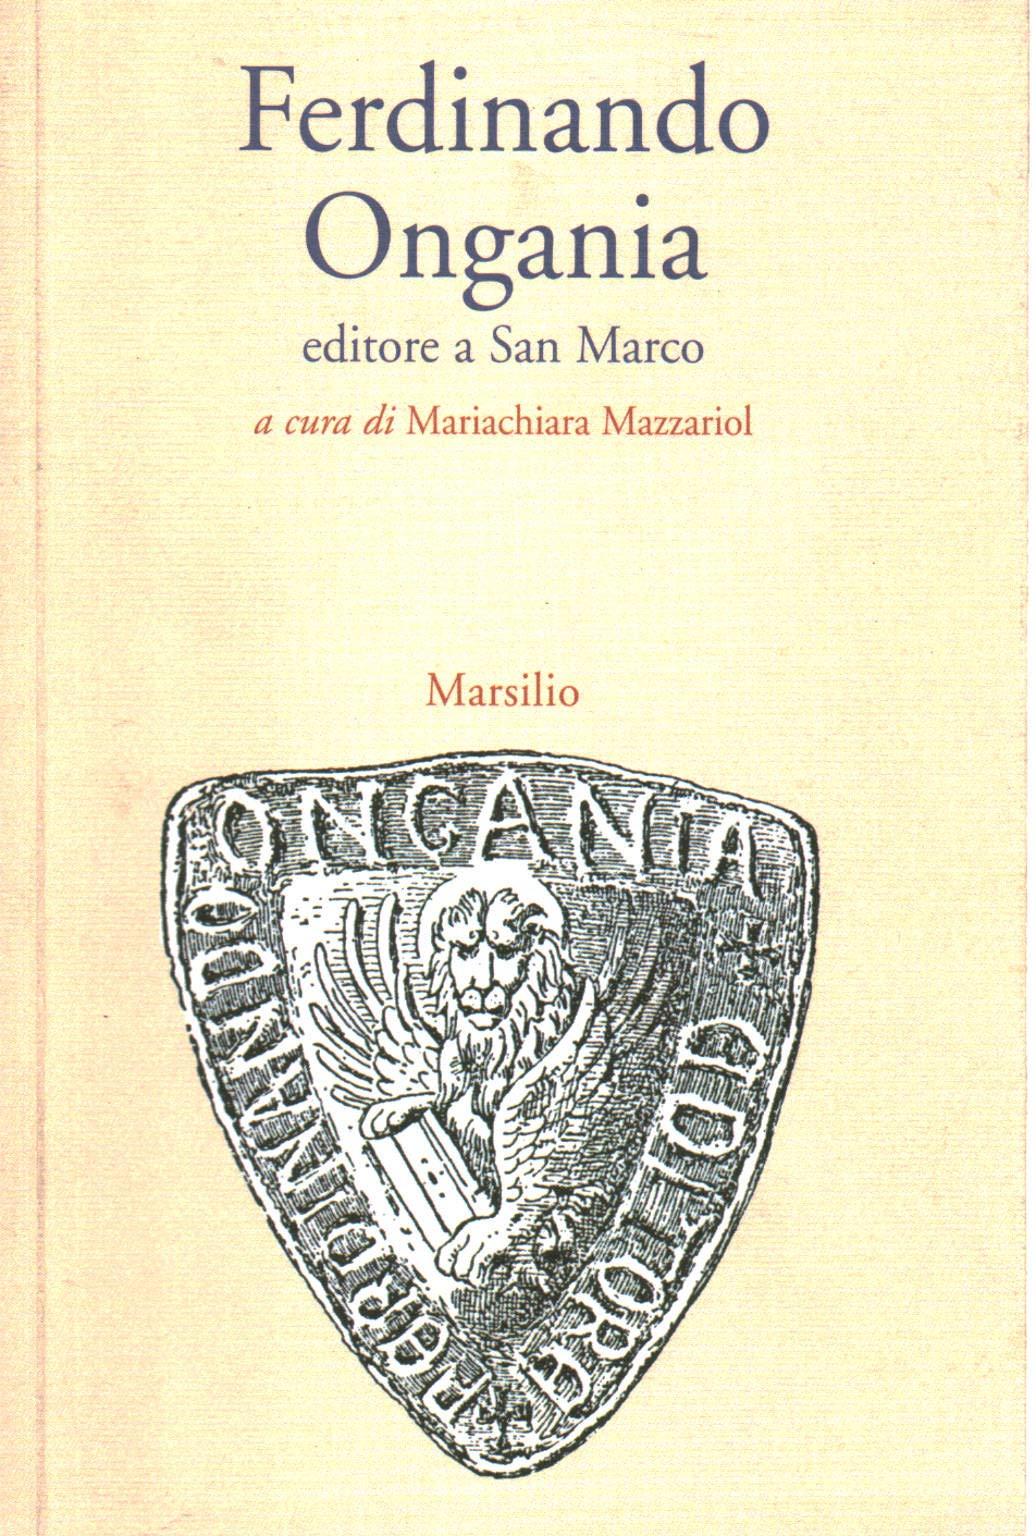 Ferdinando Ongania editore a San Marco (Italian) Paperback – 2008